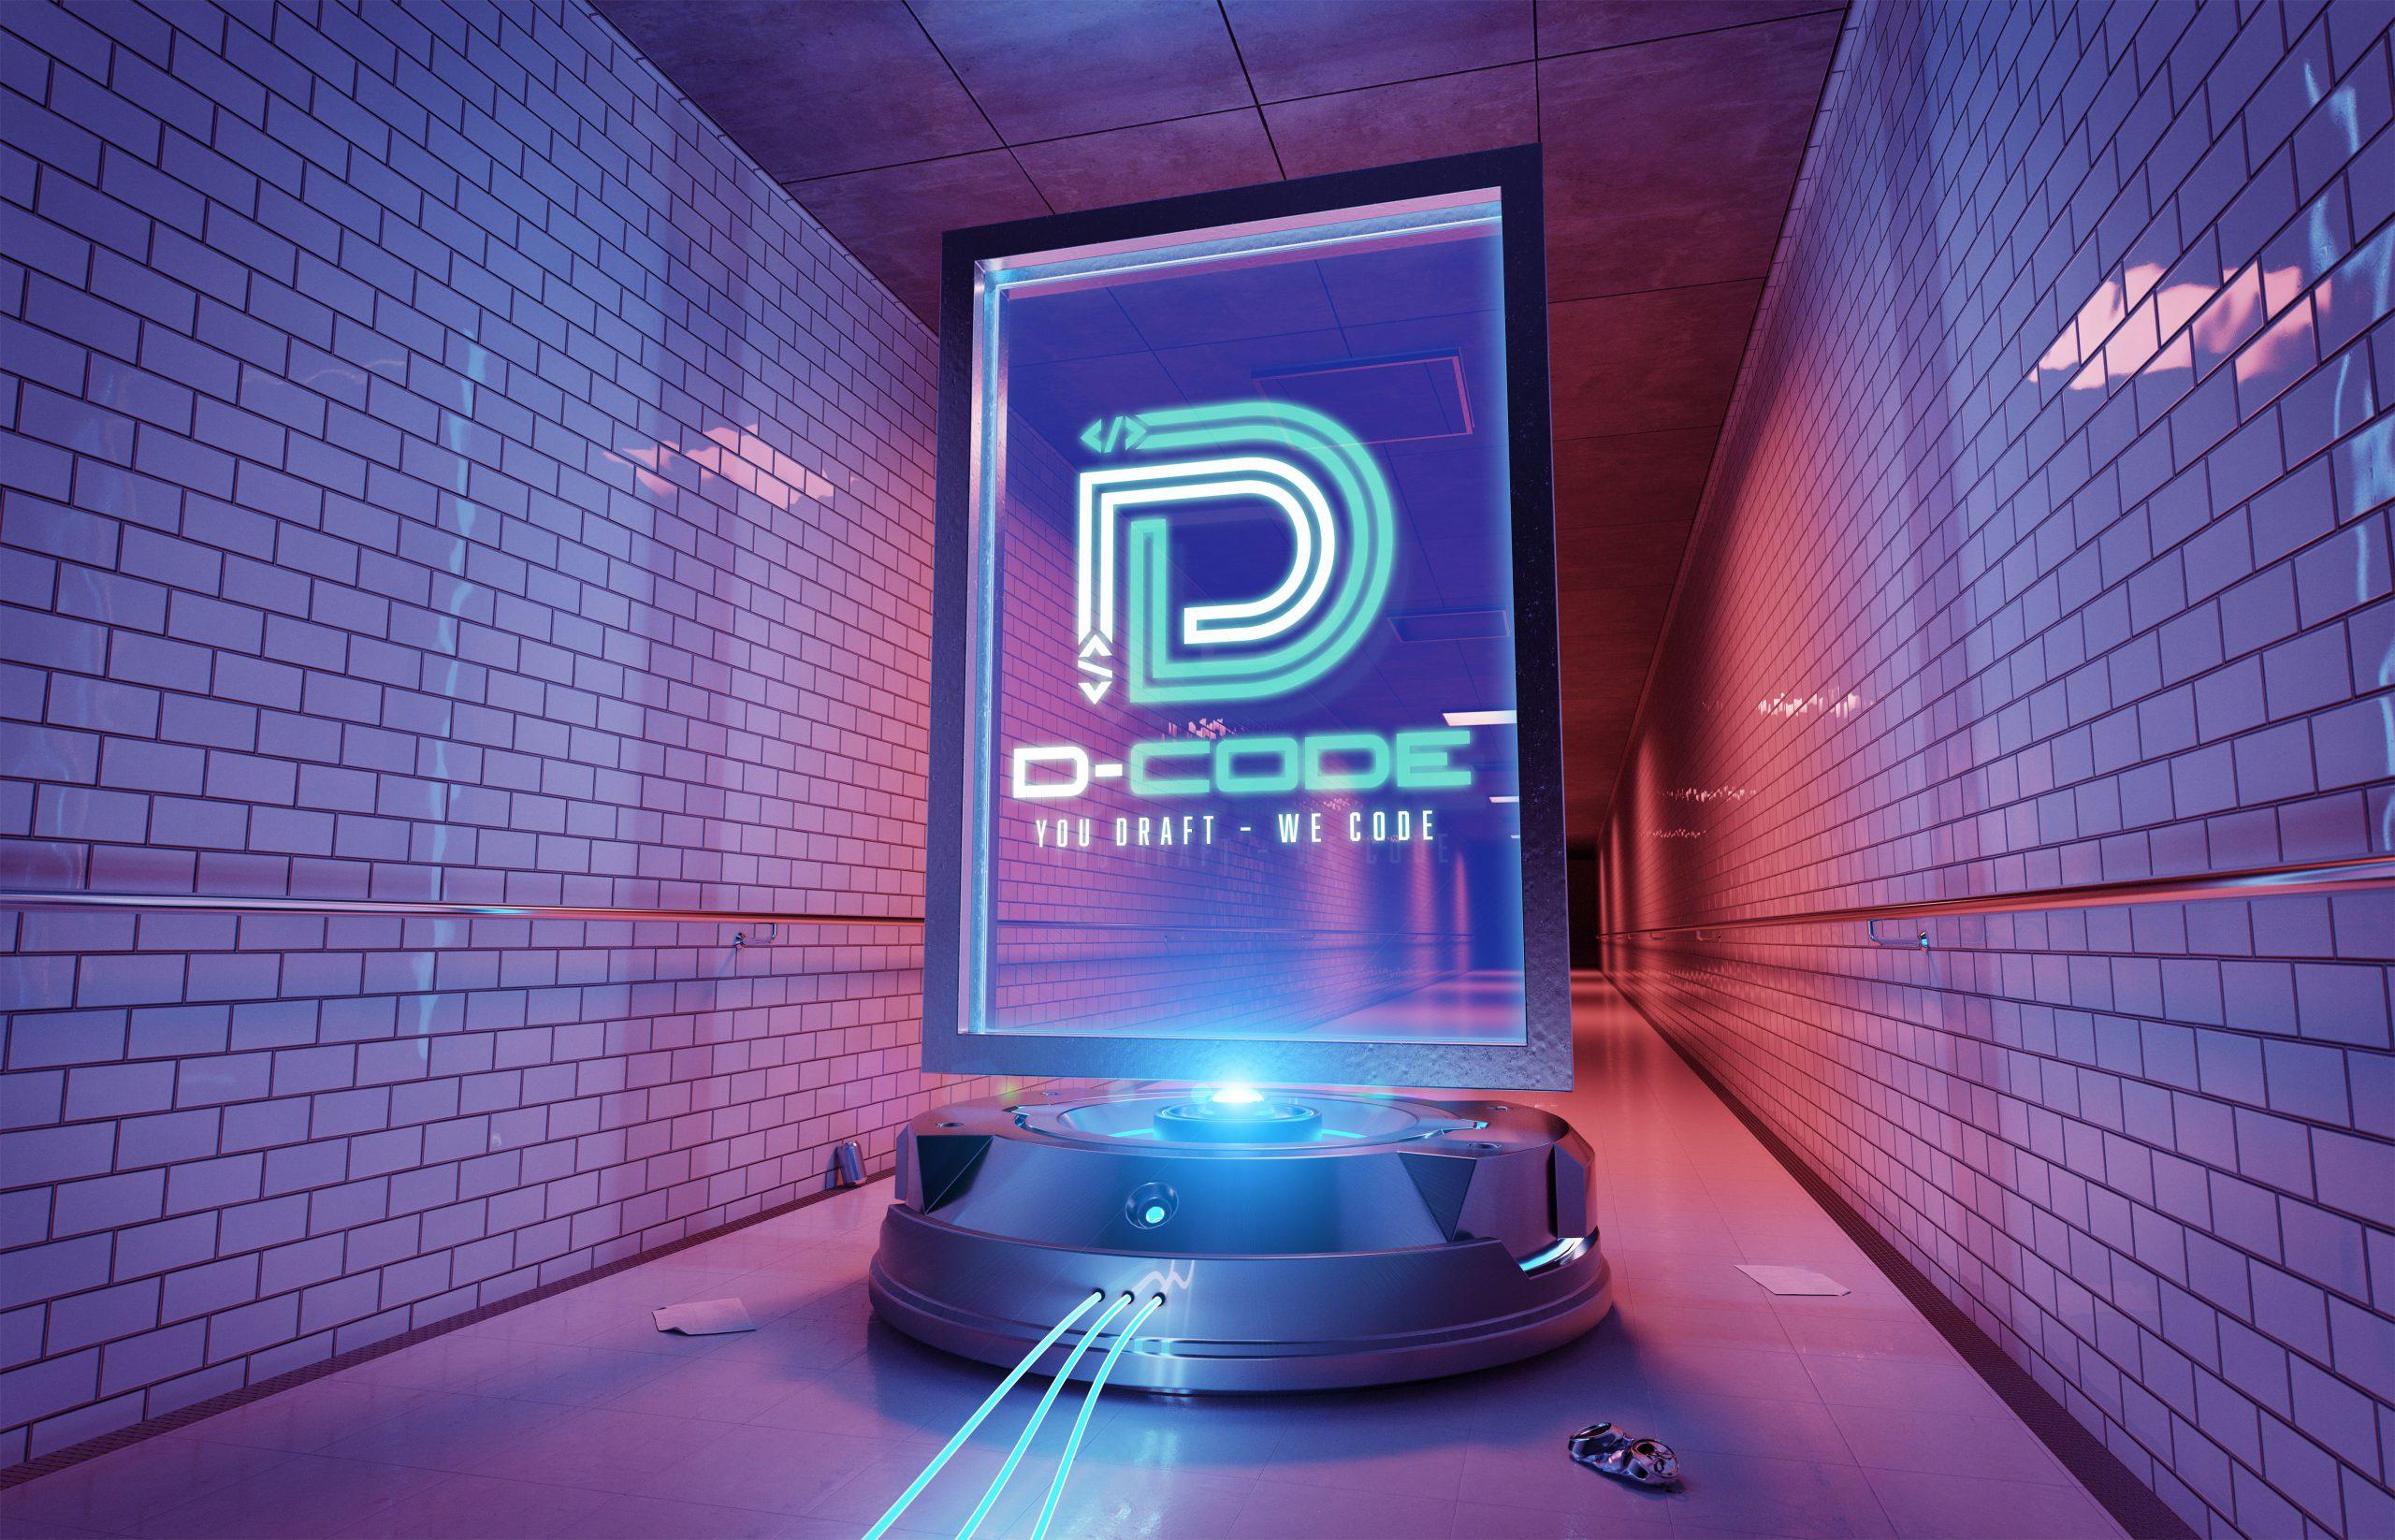 Futuristic billboard intunnel tube station mockup